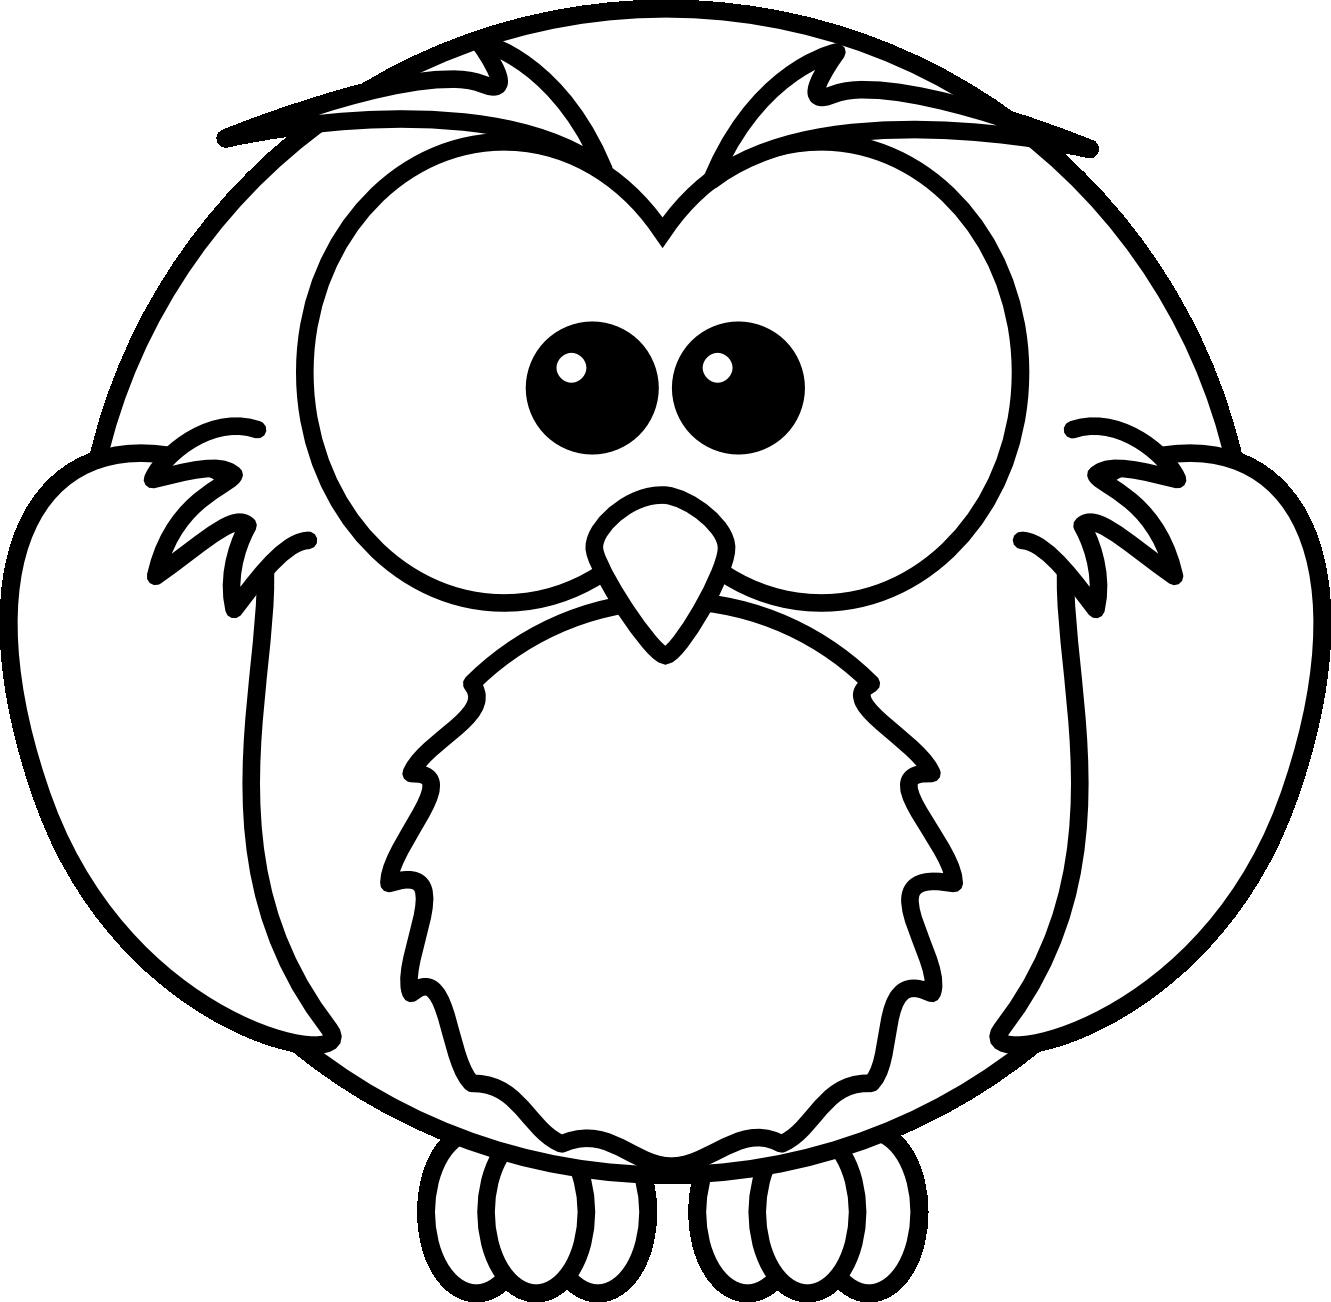 owl black white line art clipart panda free clipart images rh clipartpanda com cute owl clipart black and white owl clipart black and white vector